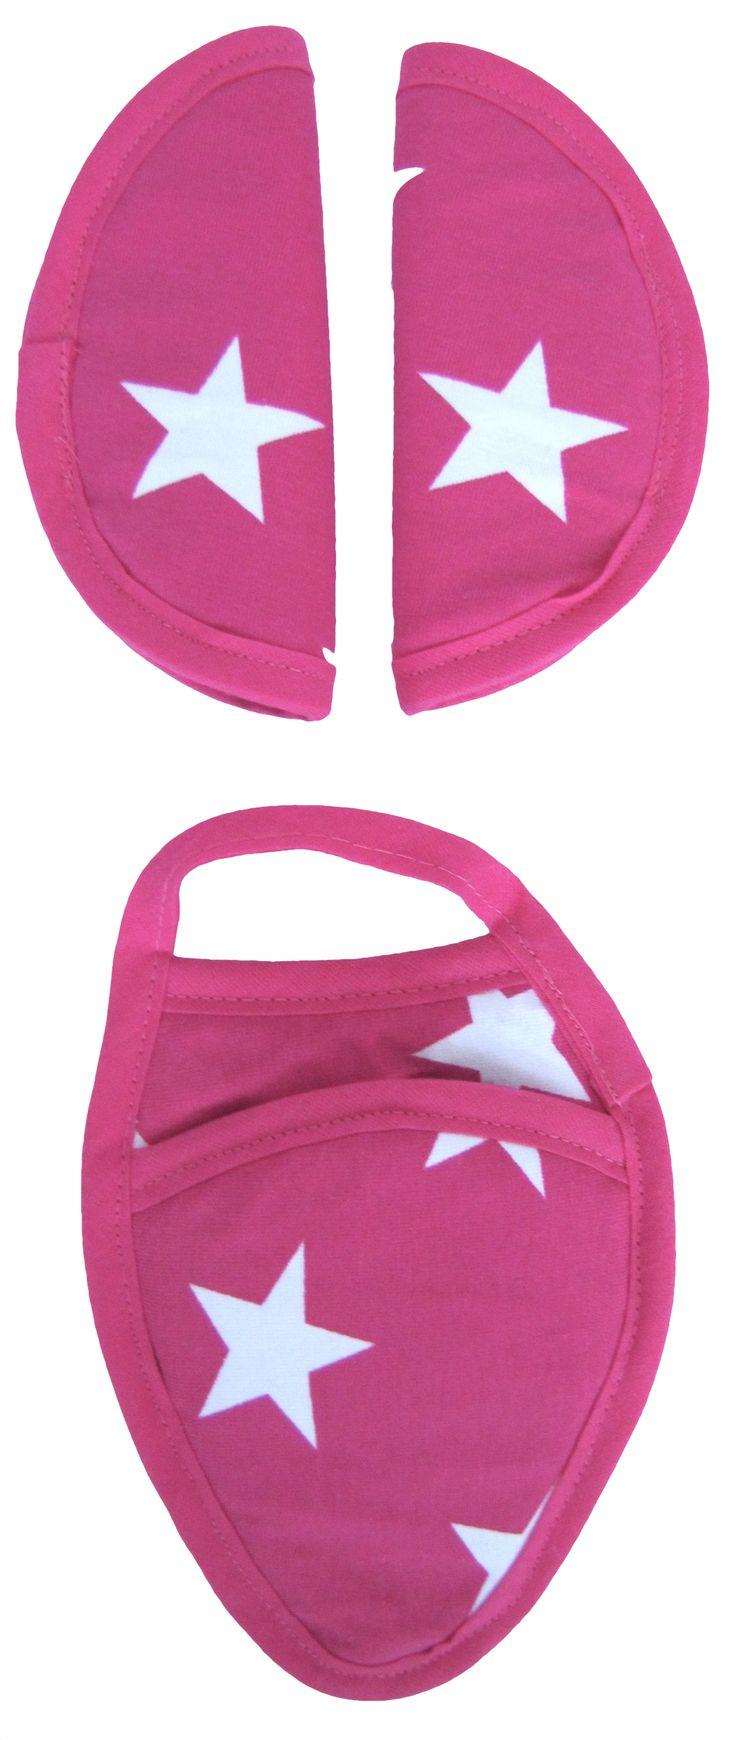 Gordelbeschermers Ster Fuchsia strap cover gurtpolster car seat maxi cosi